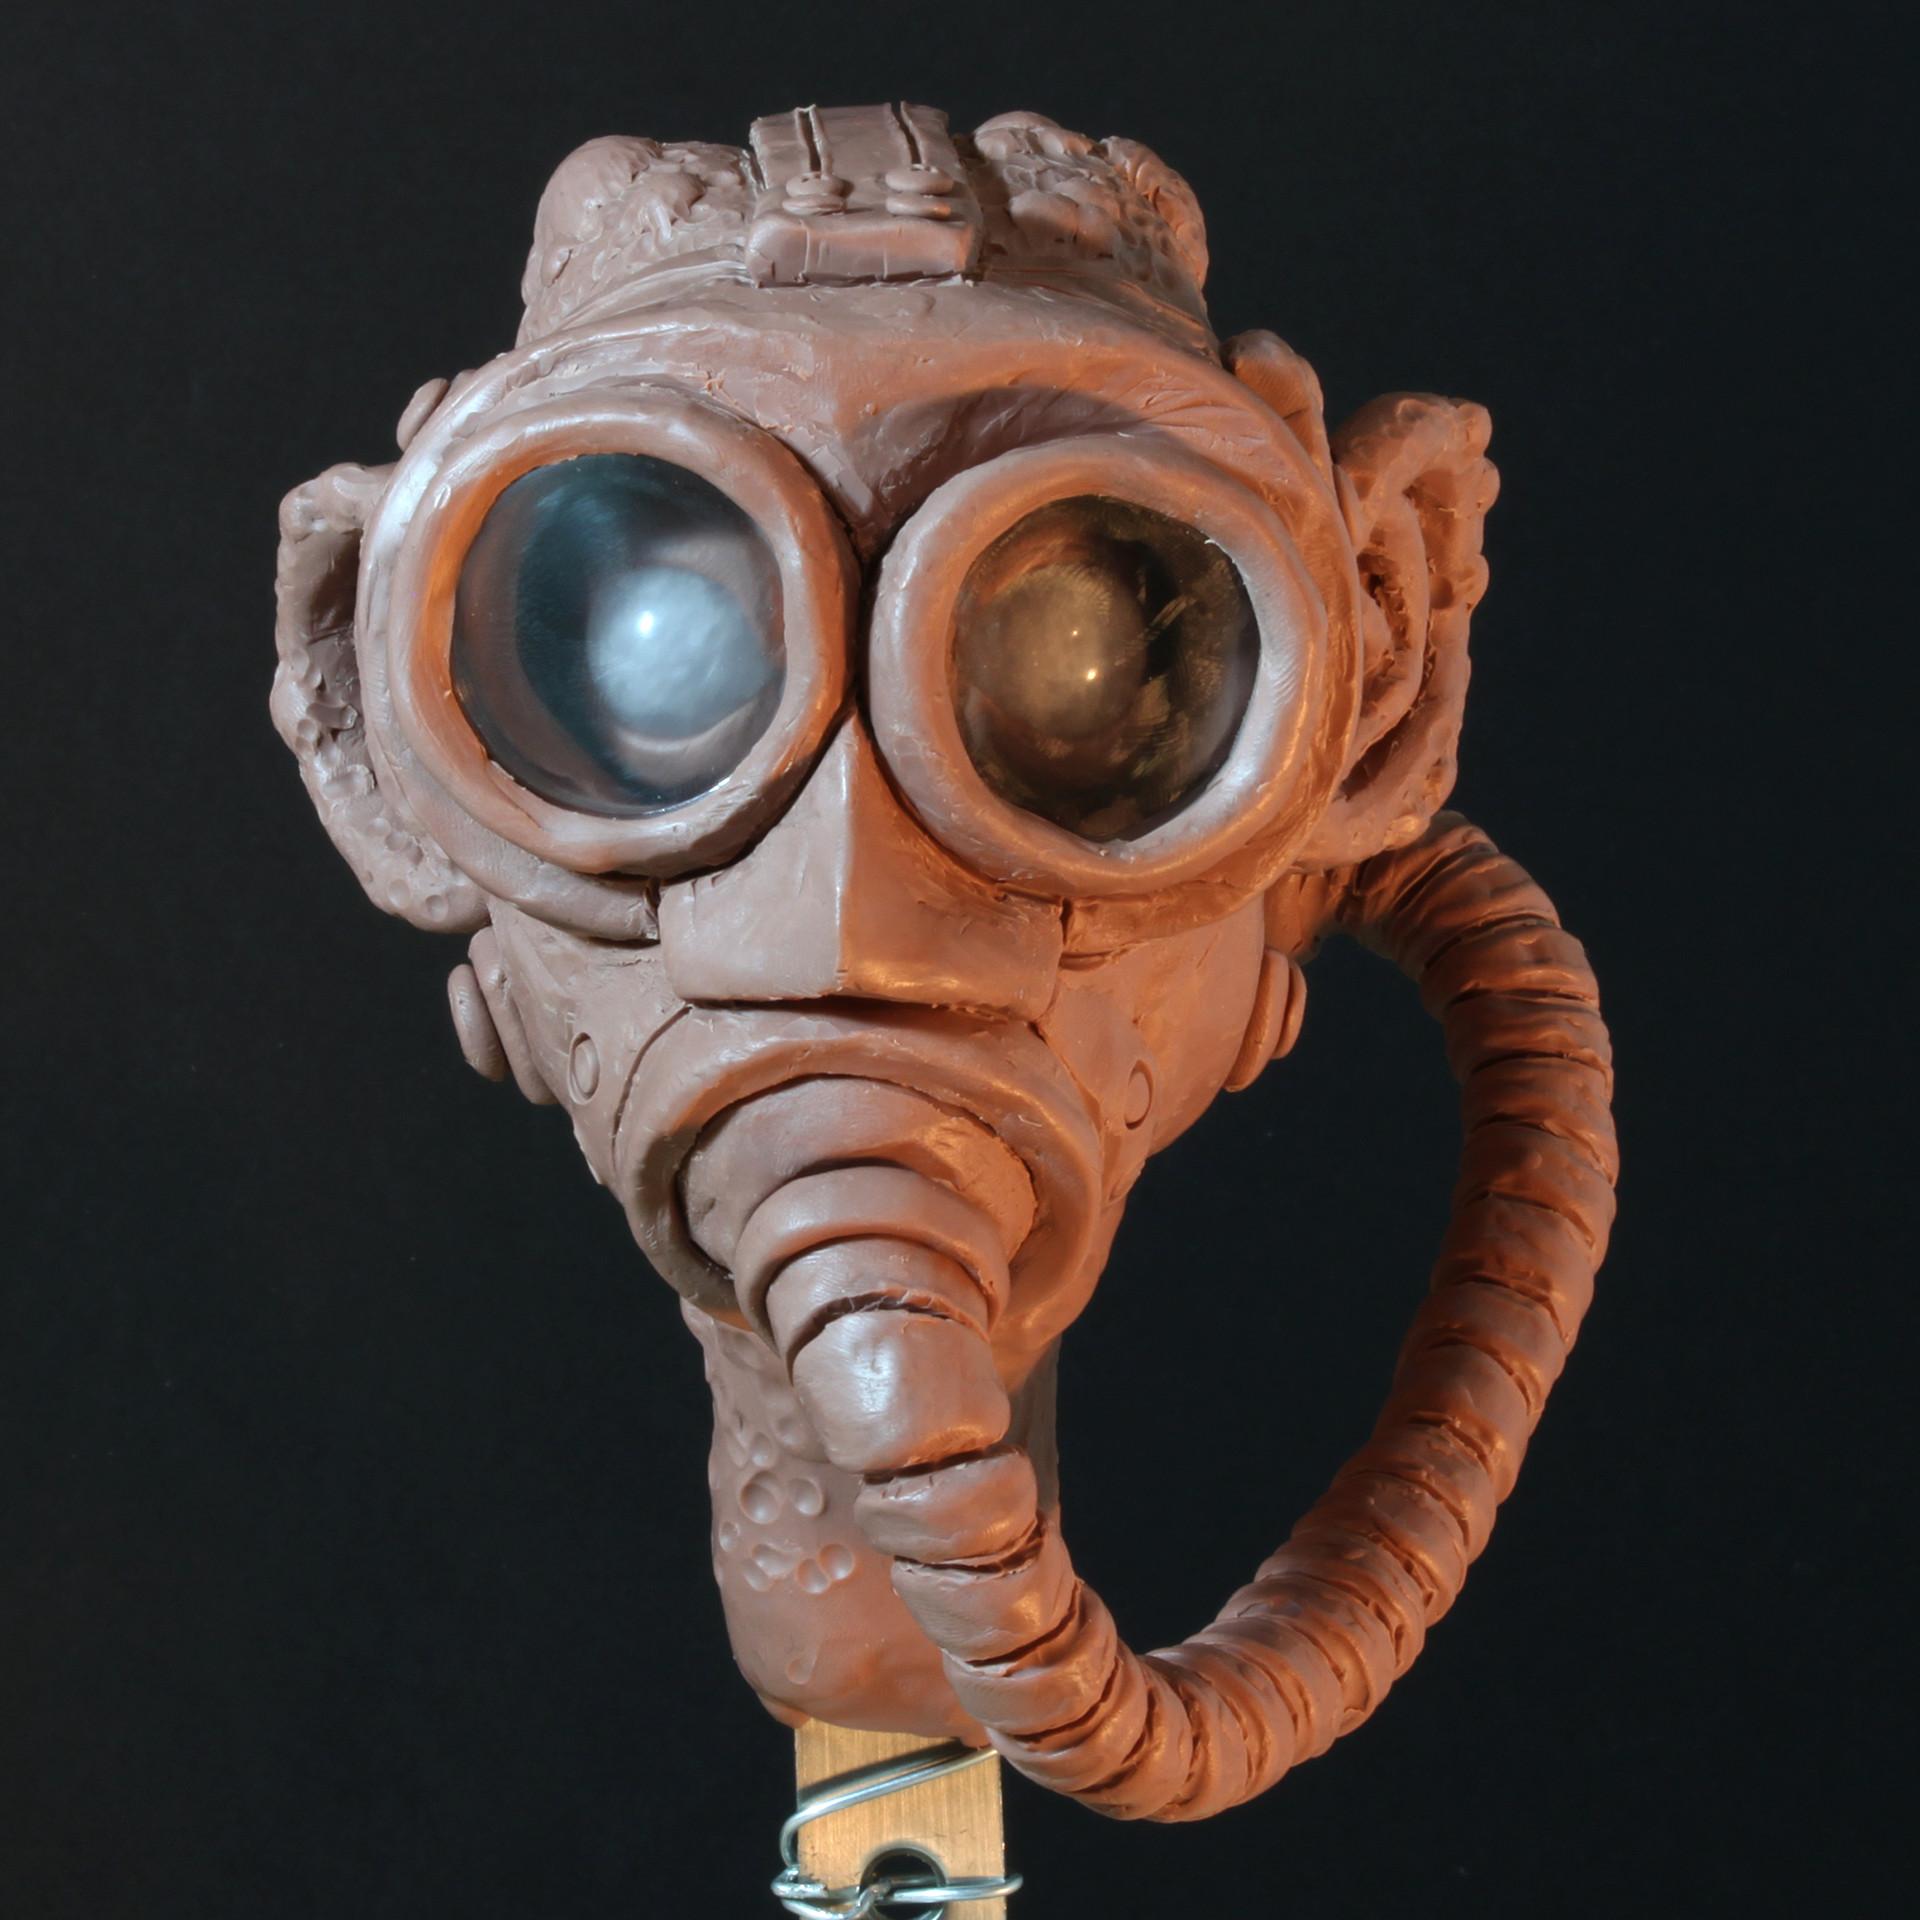 Rob mcdaniel gasmask front